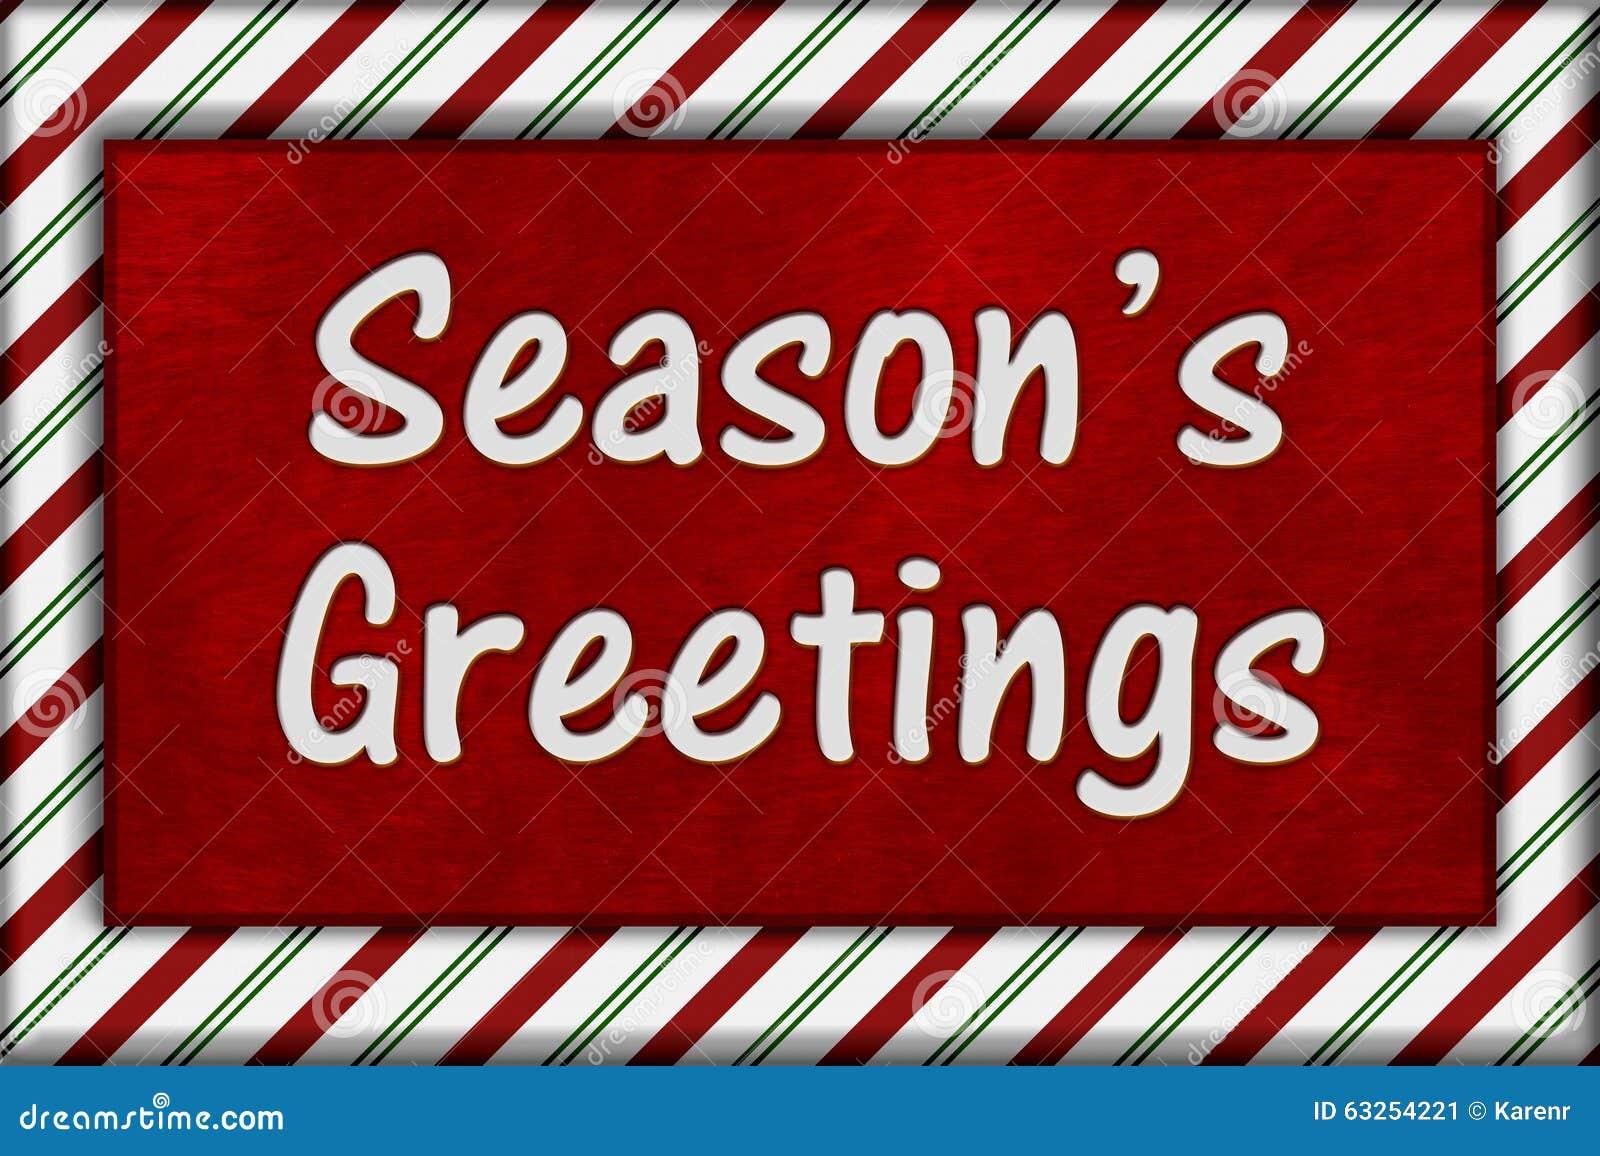 Seasons Greetings Message Stock Image Image Of Frame 63254221